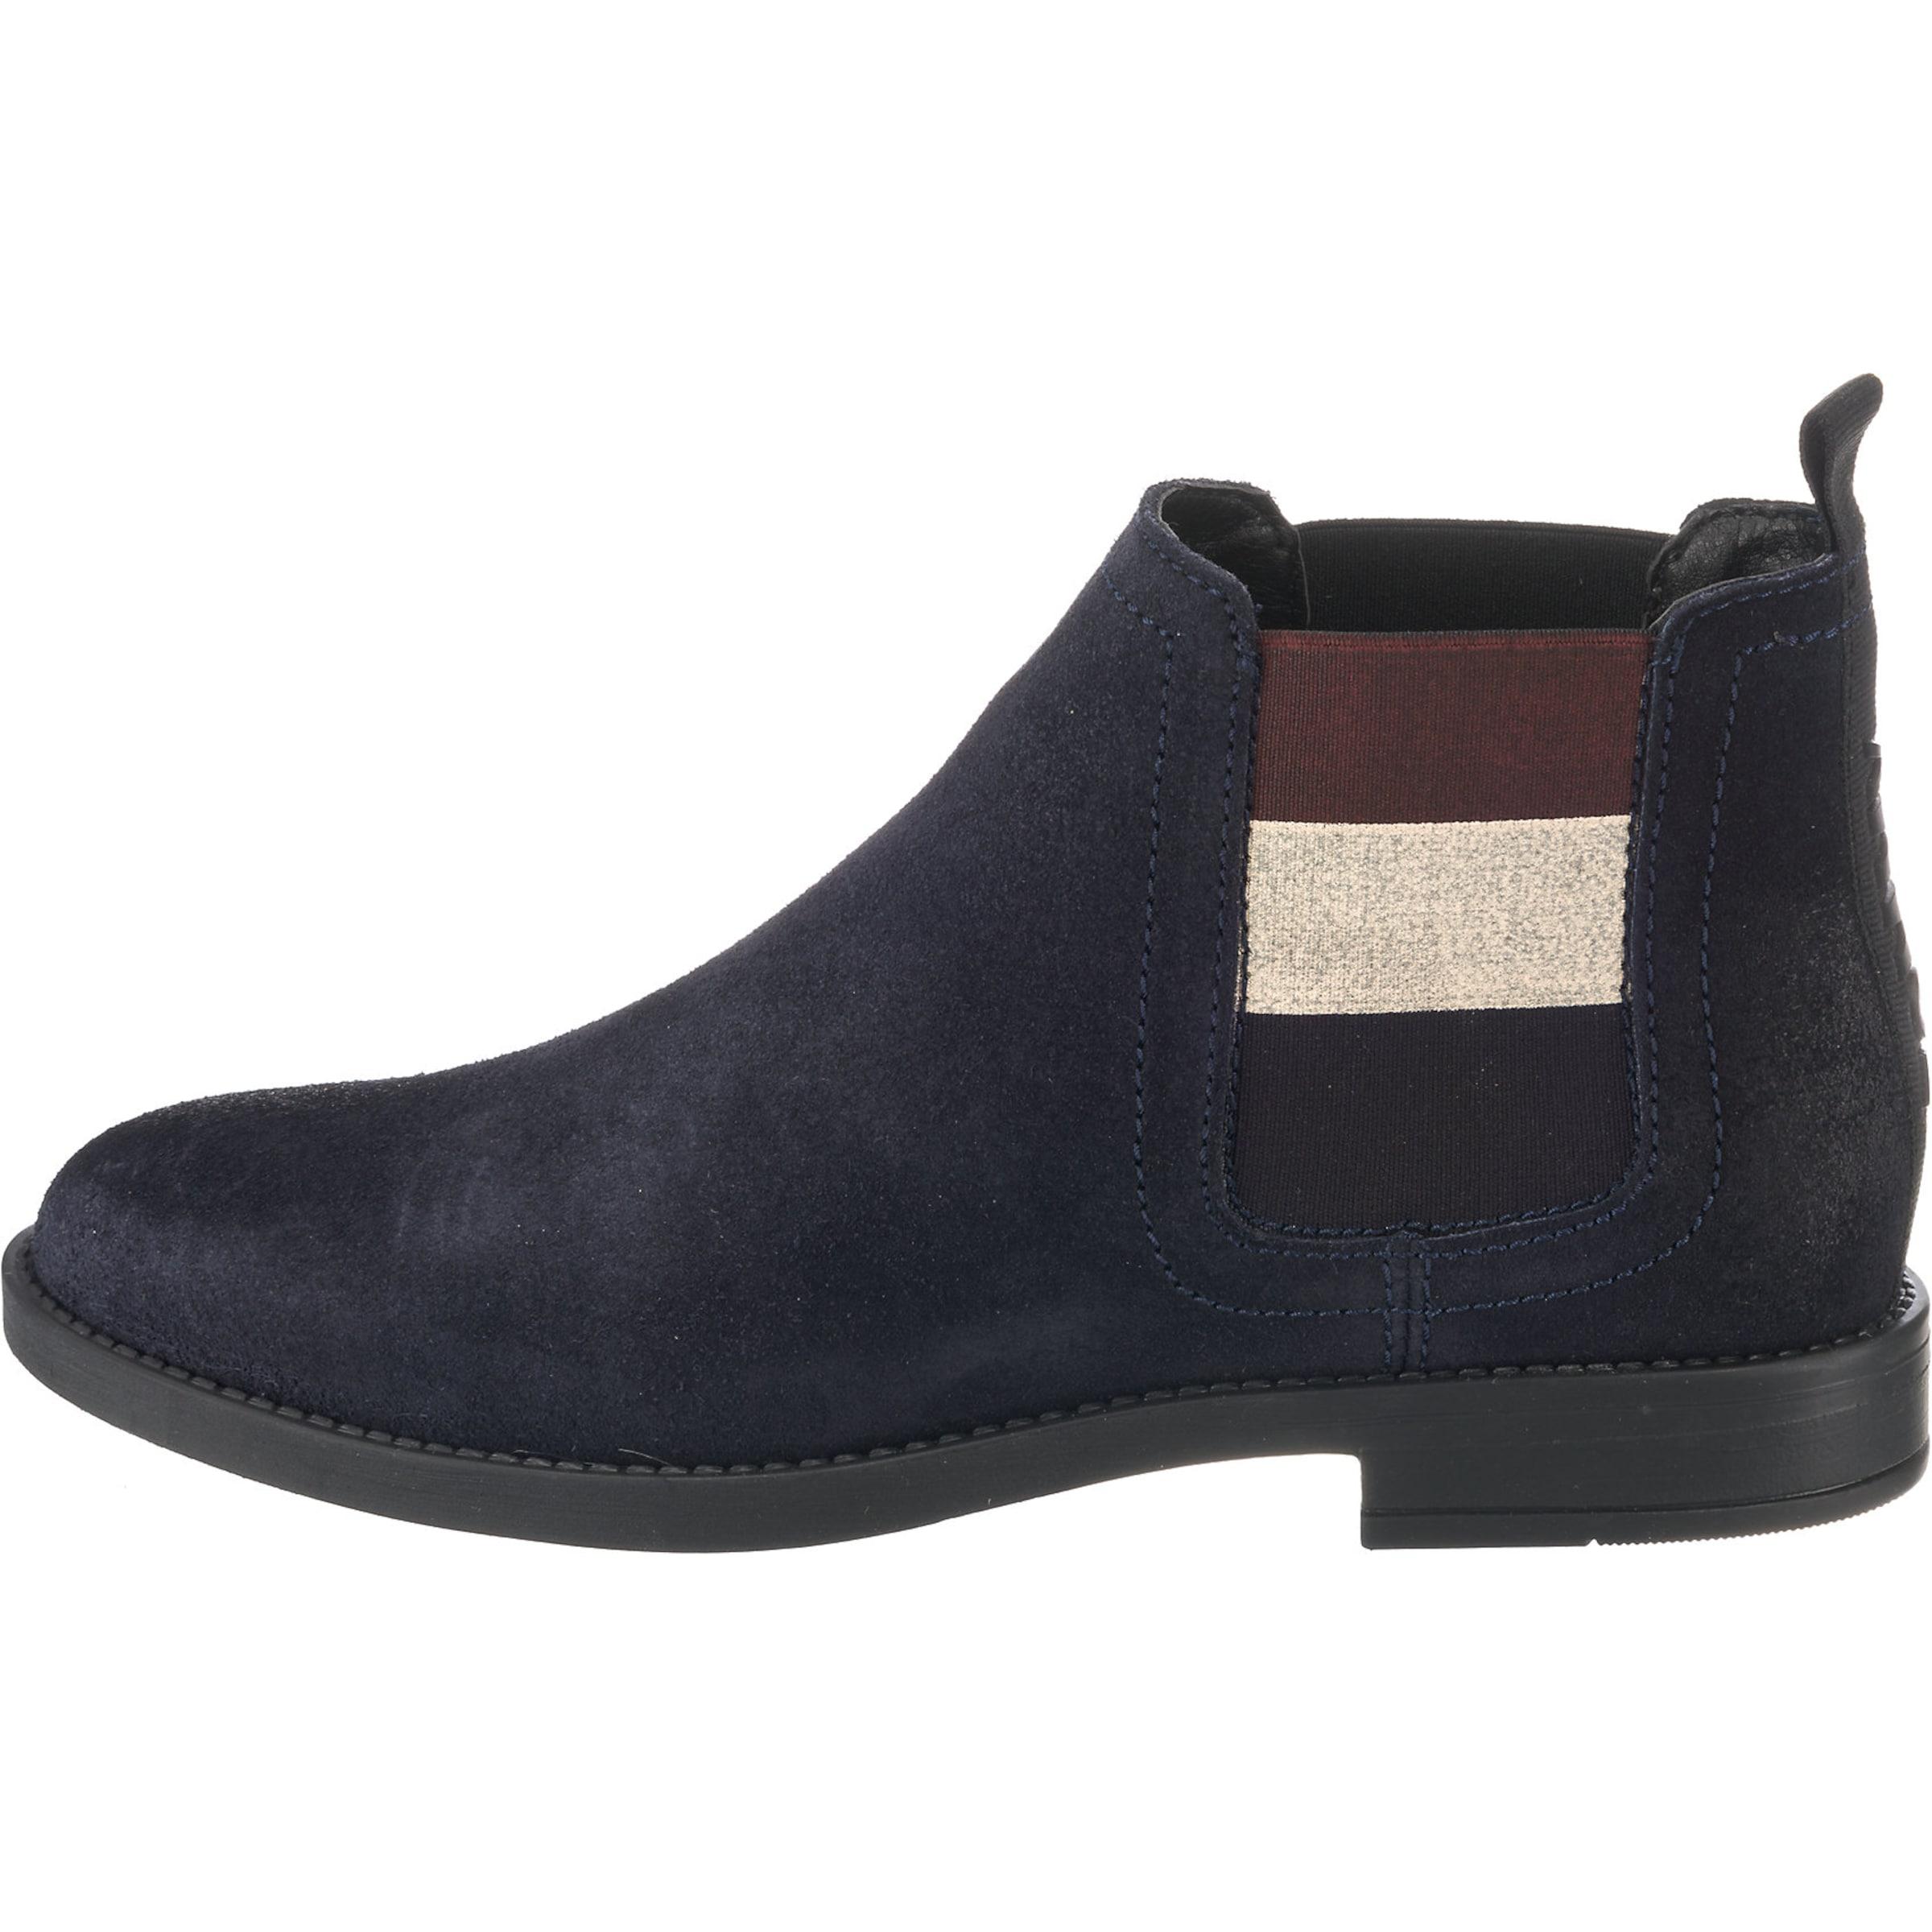 Tommy Jeans BeigeNavy Braun Boot 'essential' In ULMVzqpSG